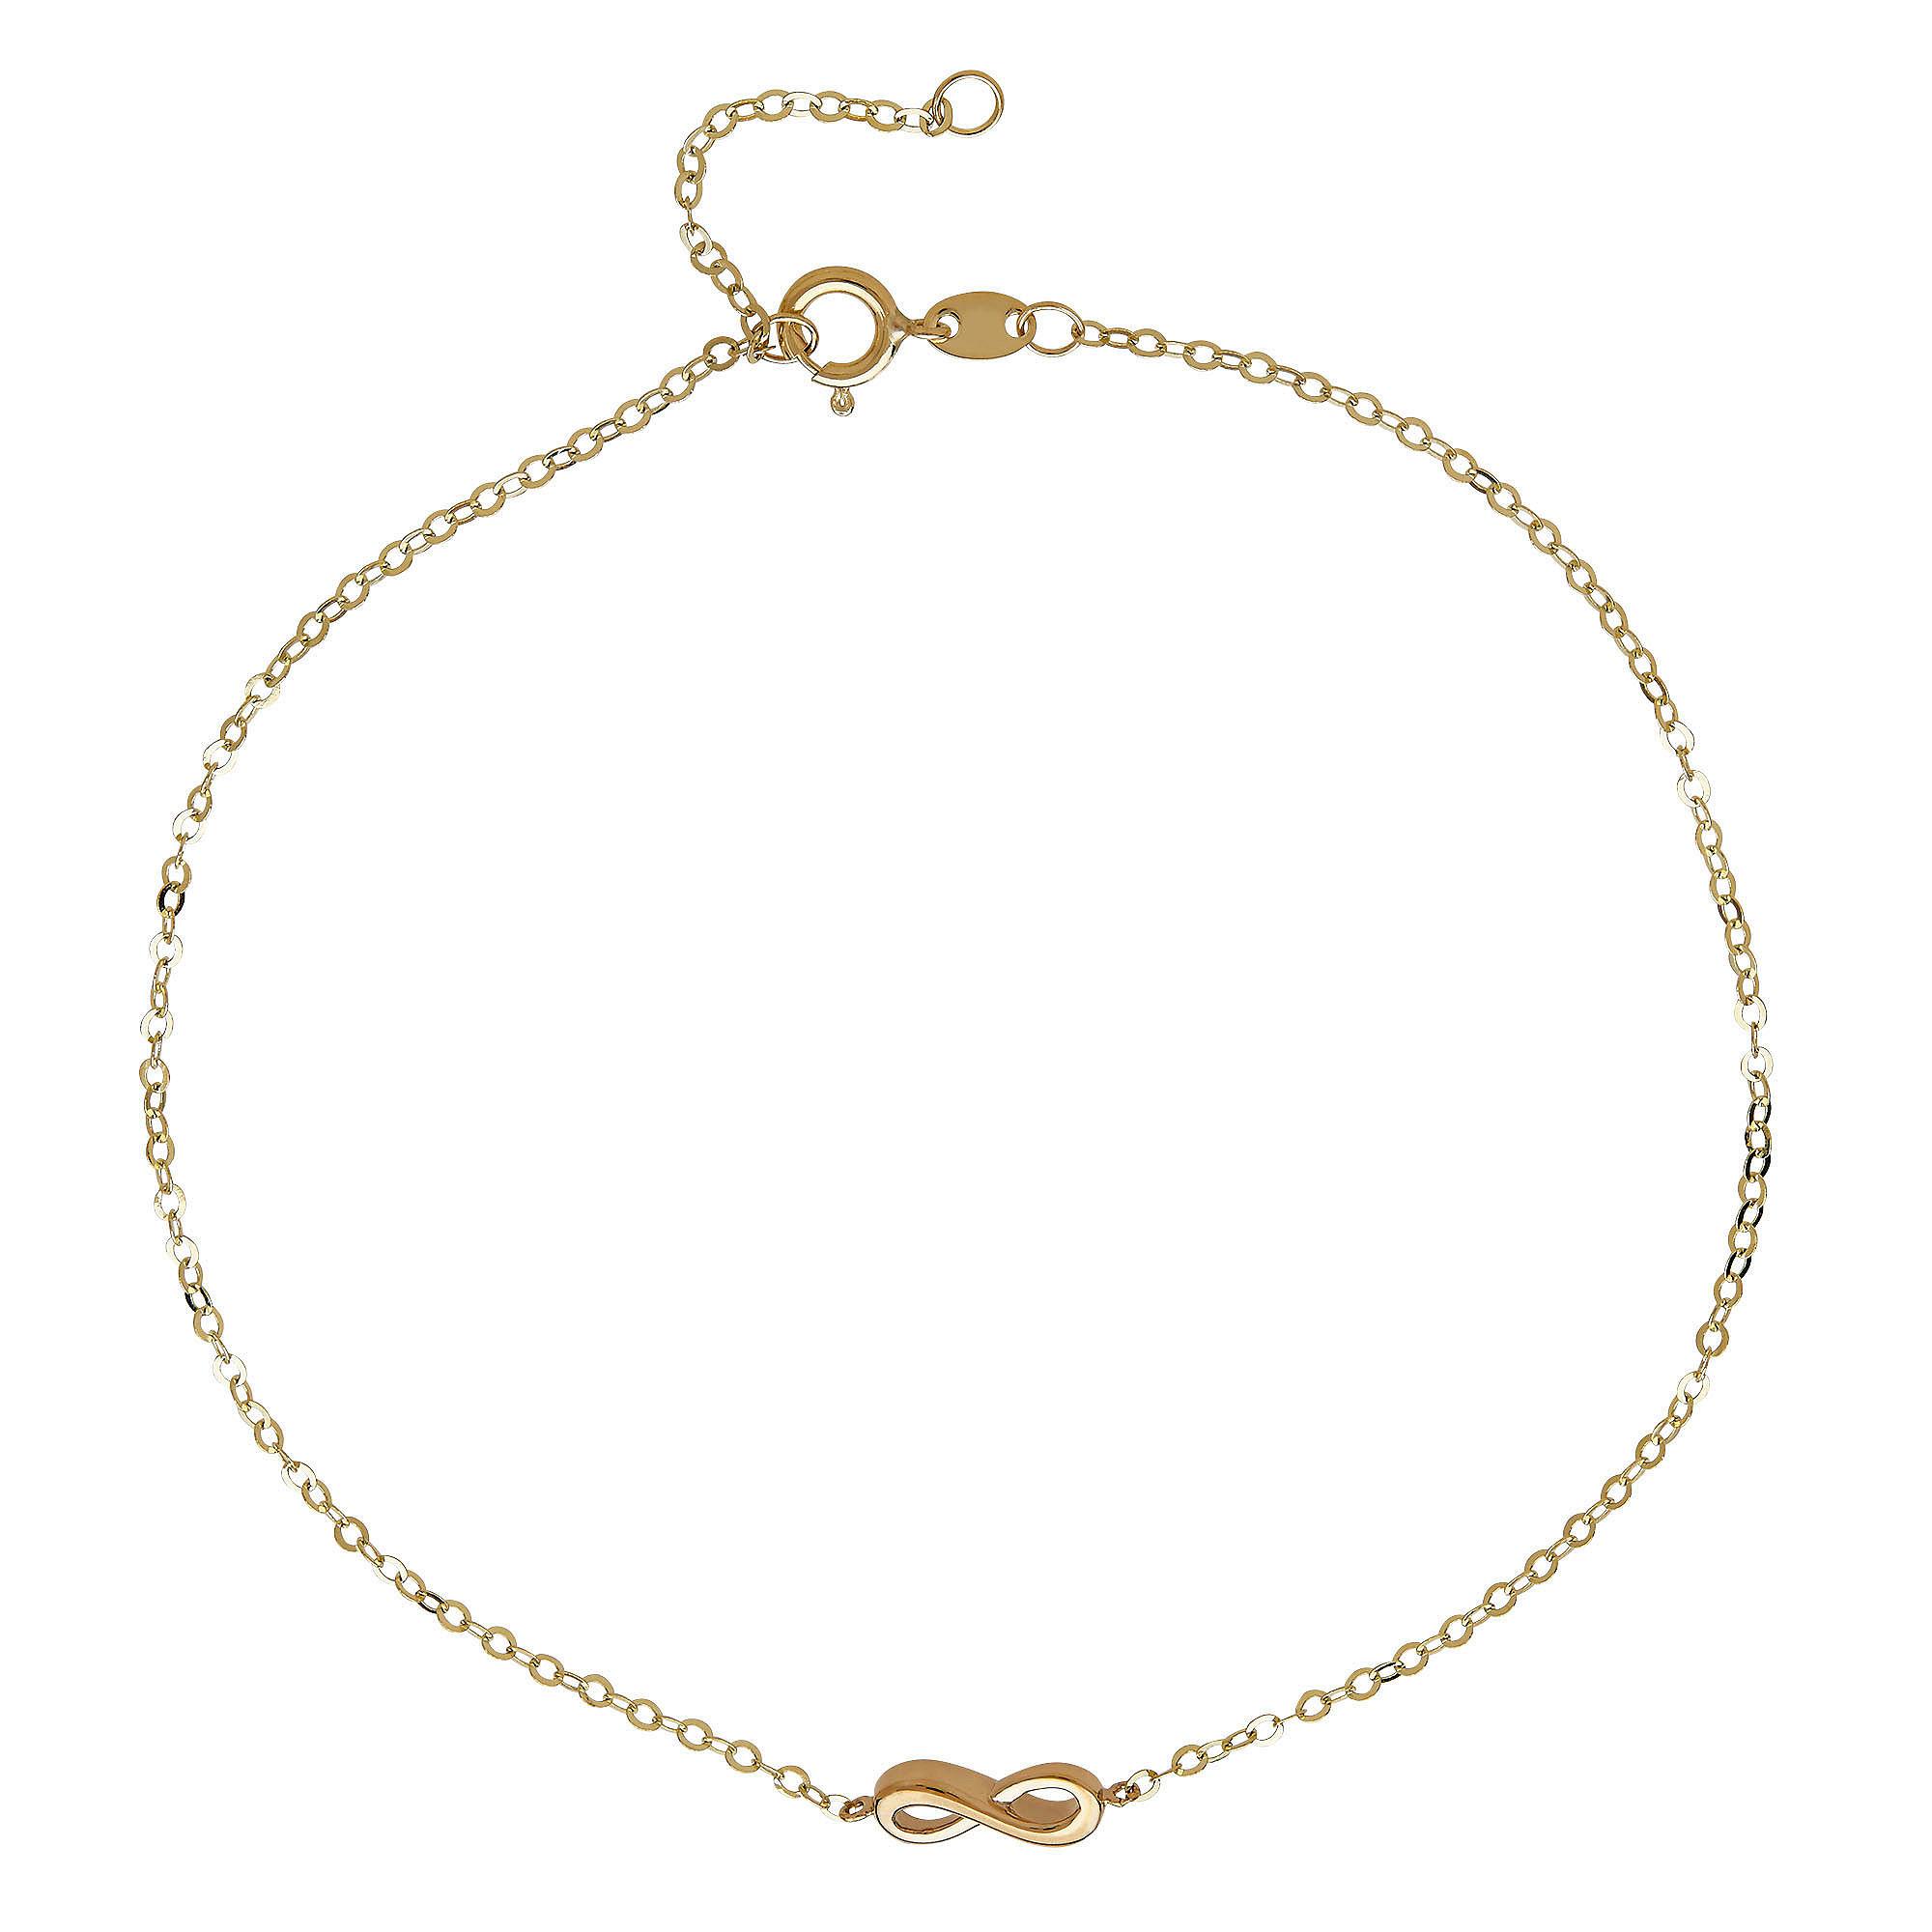 14K Yellow Gold Infnity Ankle Bracelet